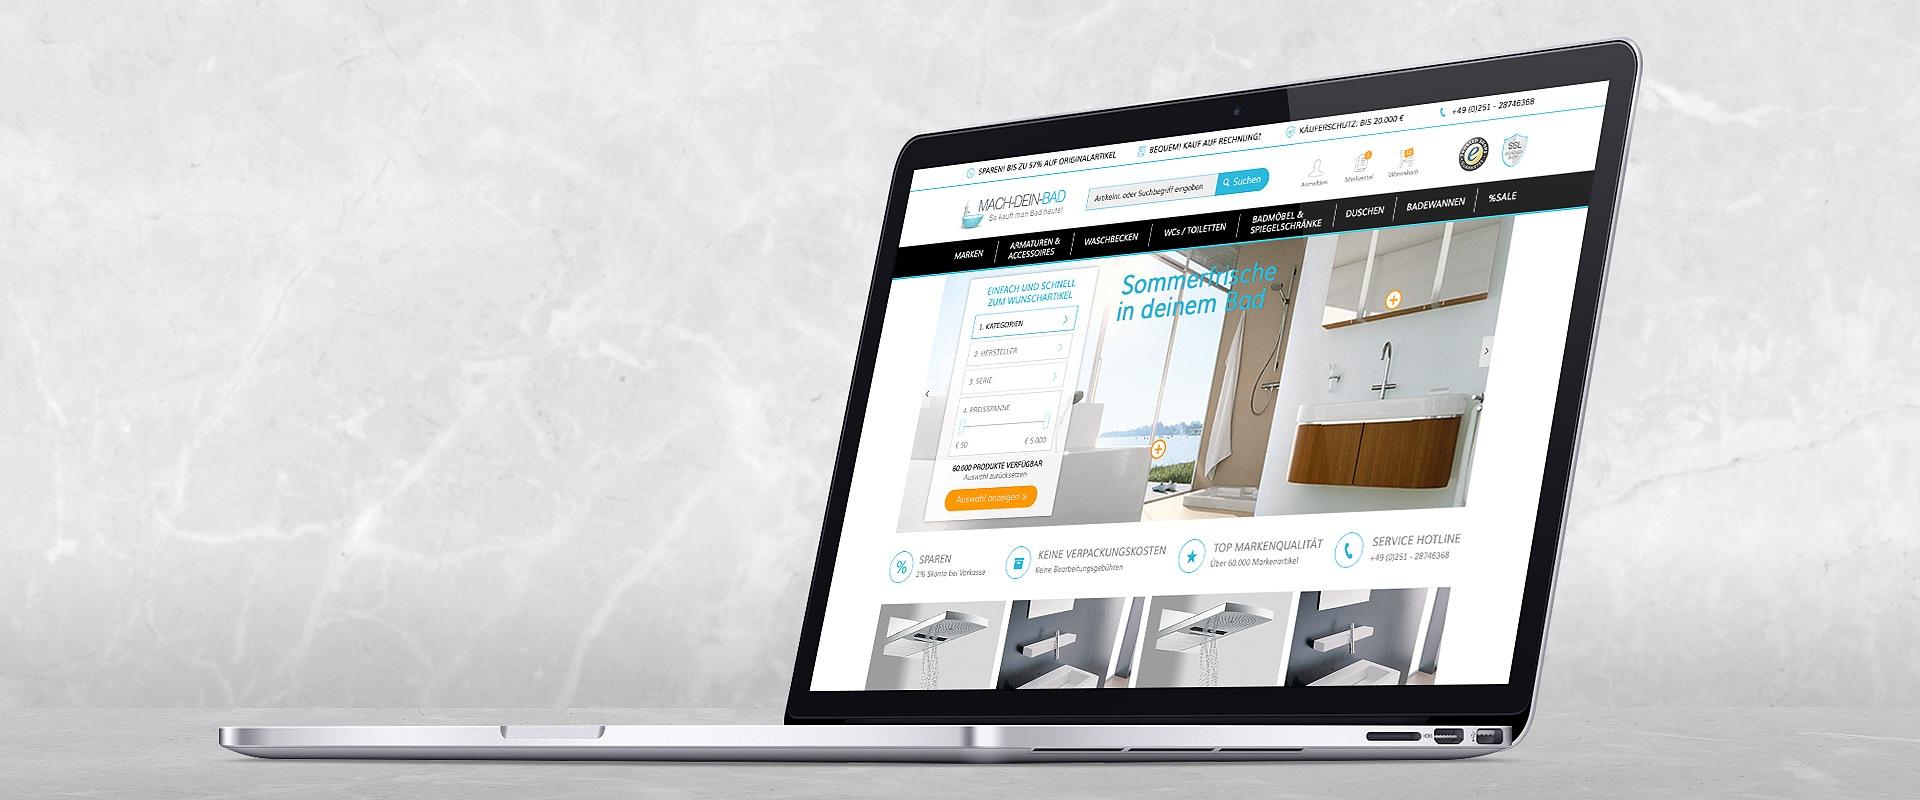 Shopware Onlineshop Entwicklung Mach Dein Badde E Commerce